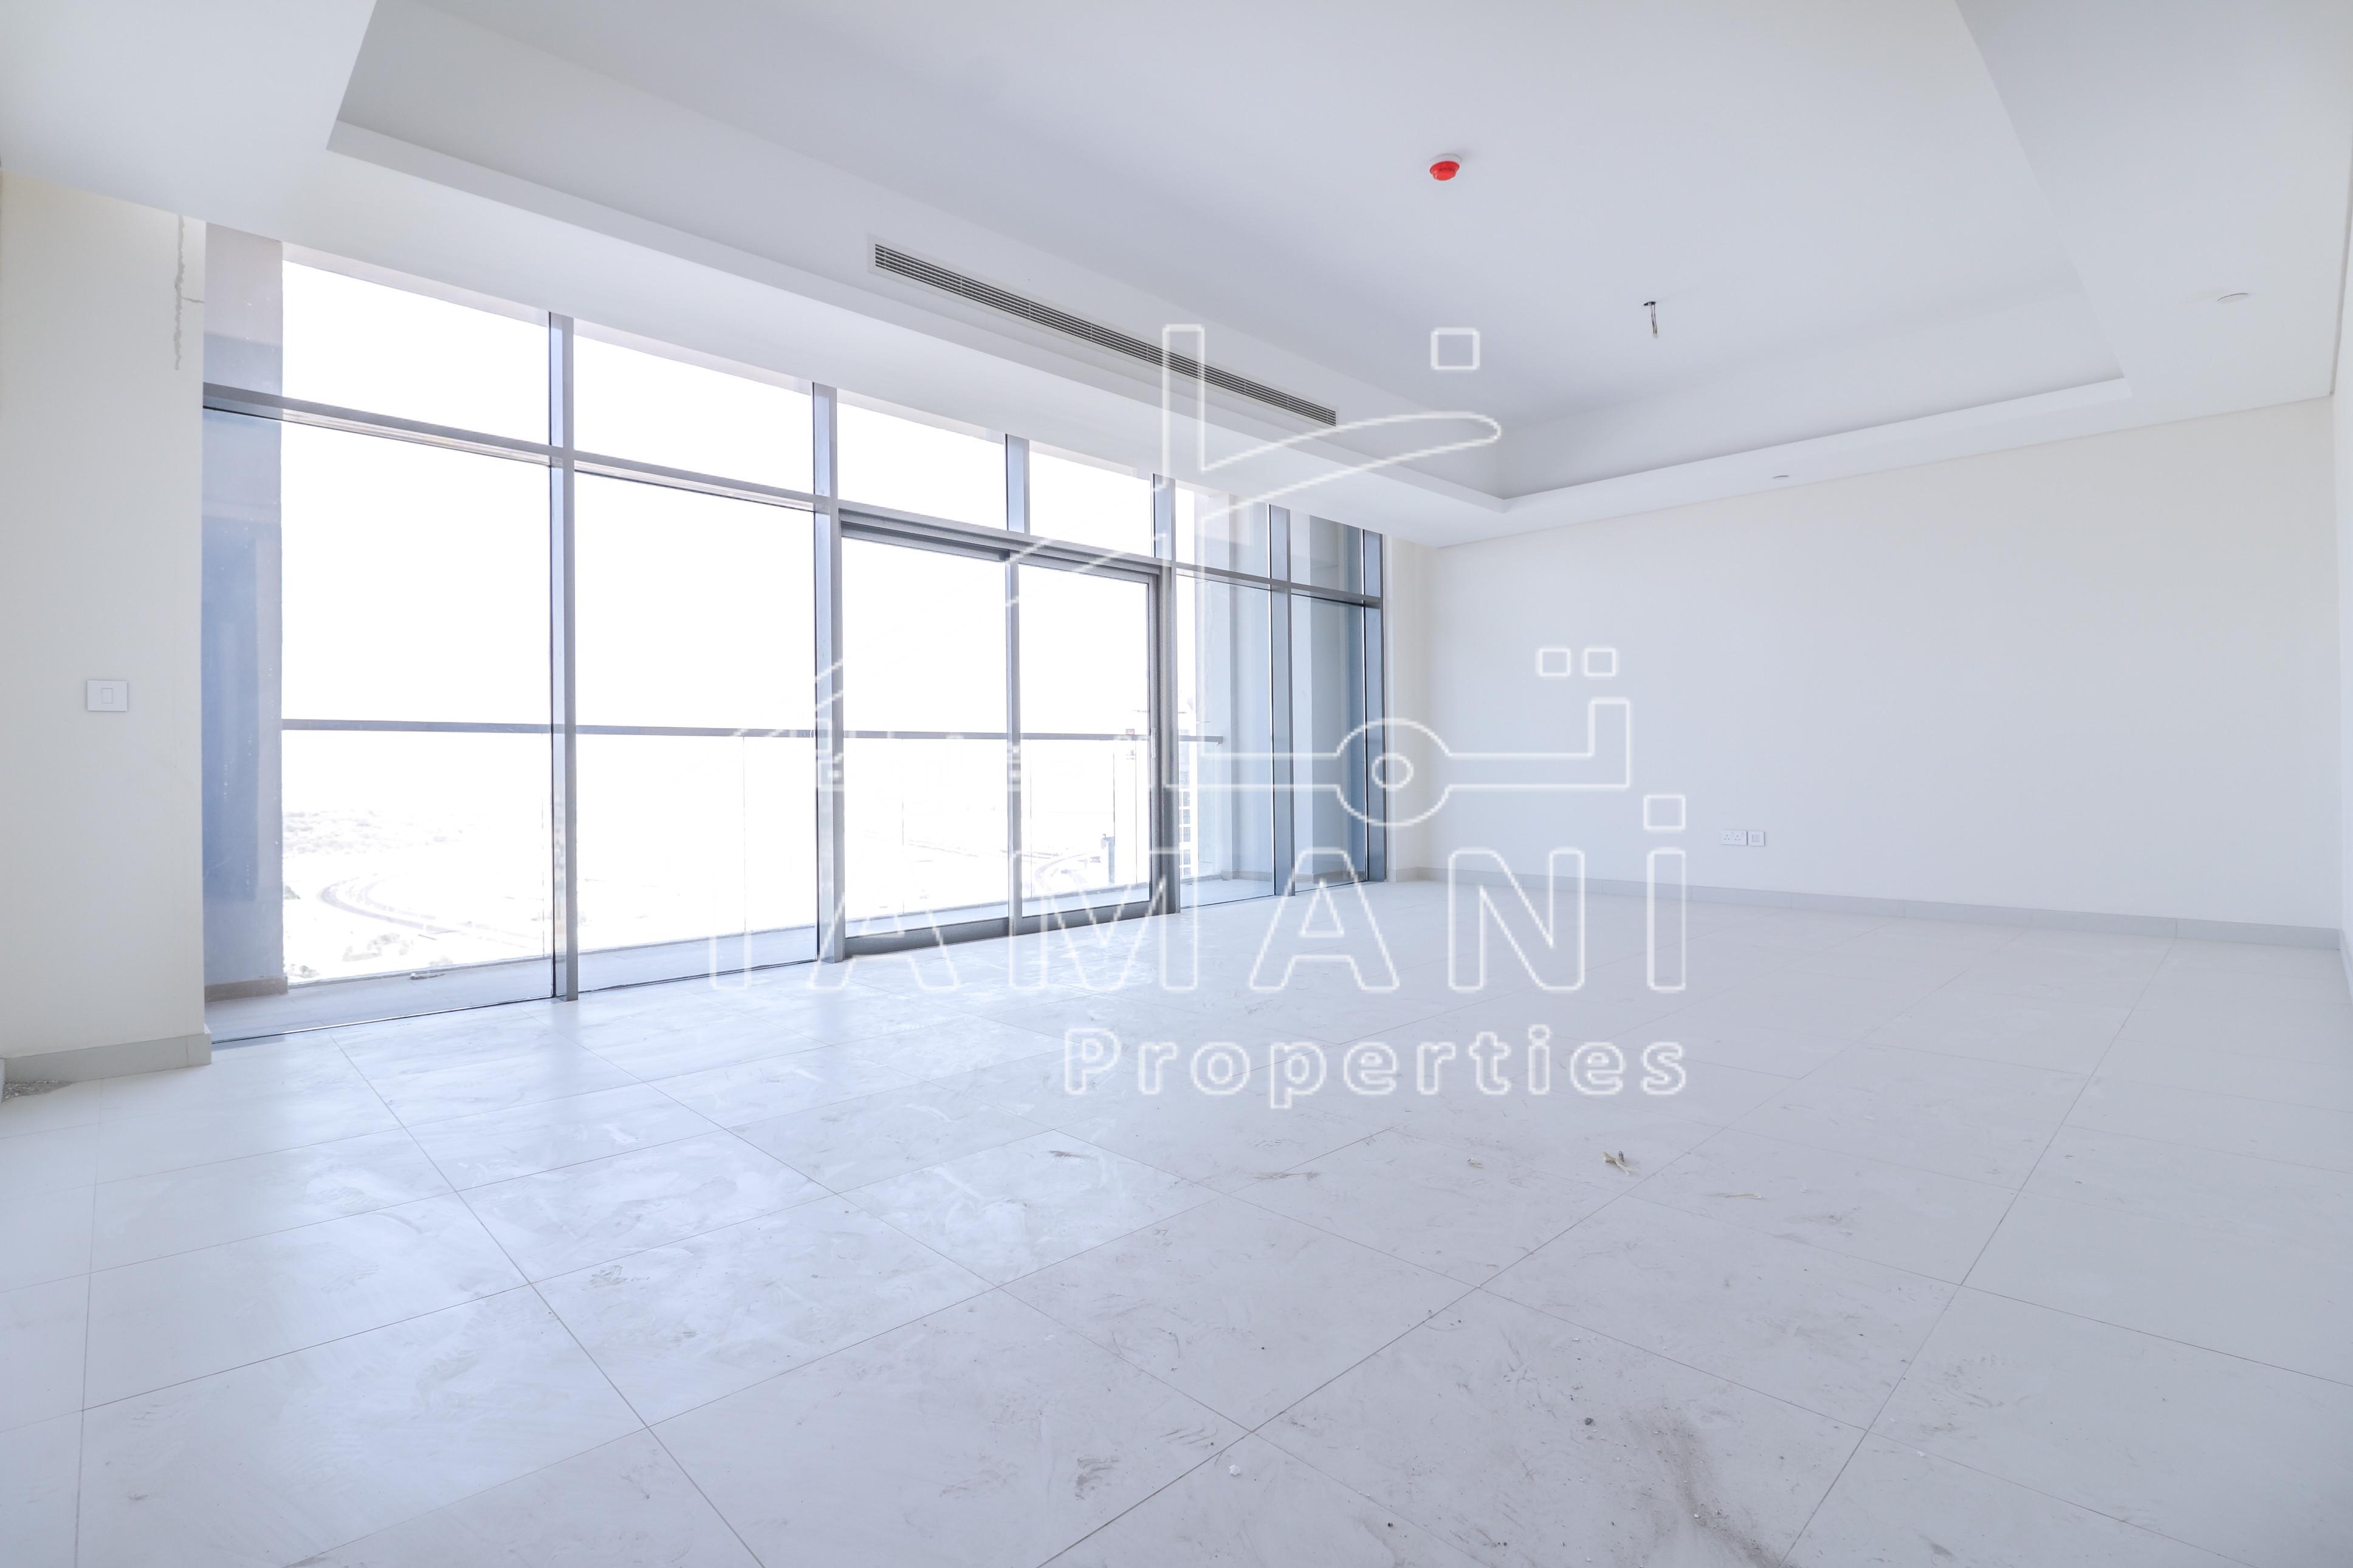 New 3 Bed Rooms Corner unit, Facing lake - Mada Residences by ARTAR